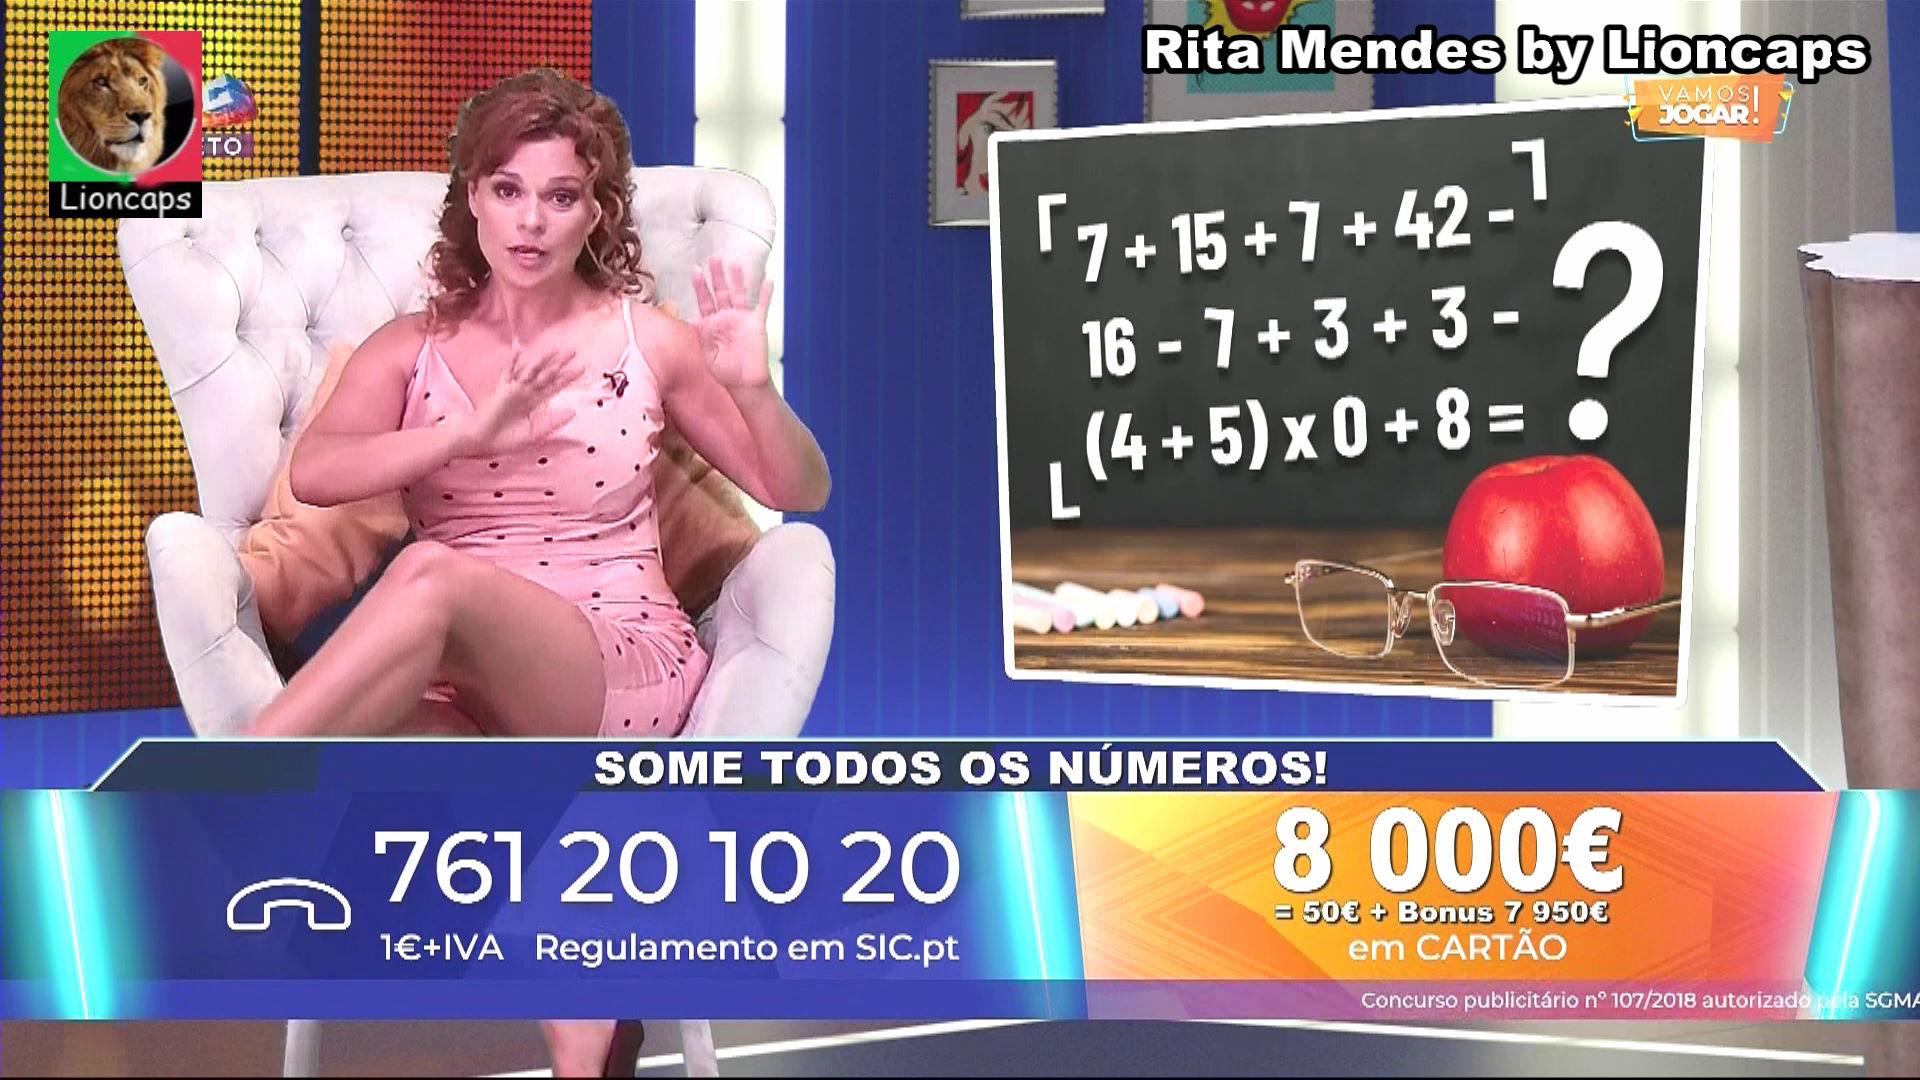 451408661_rita_mendes_vs190324_1571_122_3lo.JPG